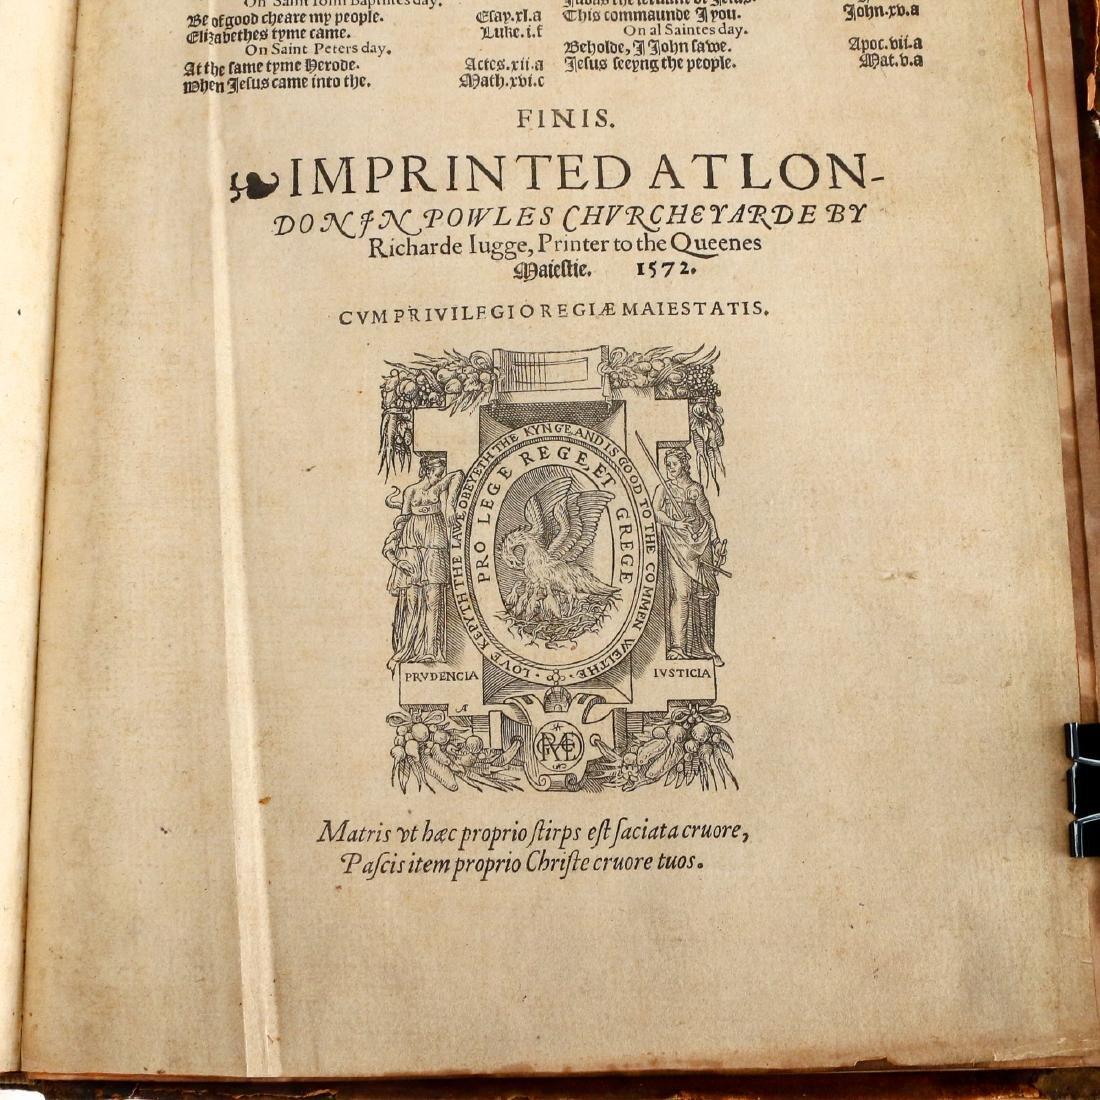 [FRANCIS FRY COPY] BISHOPS' BIBLE [1572] - 2